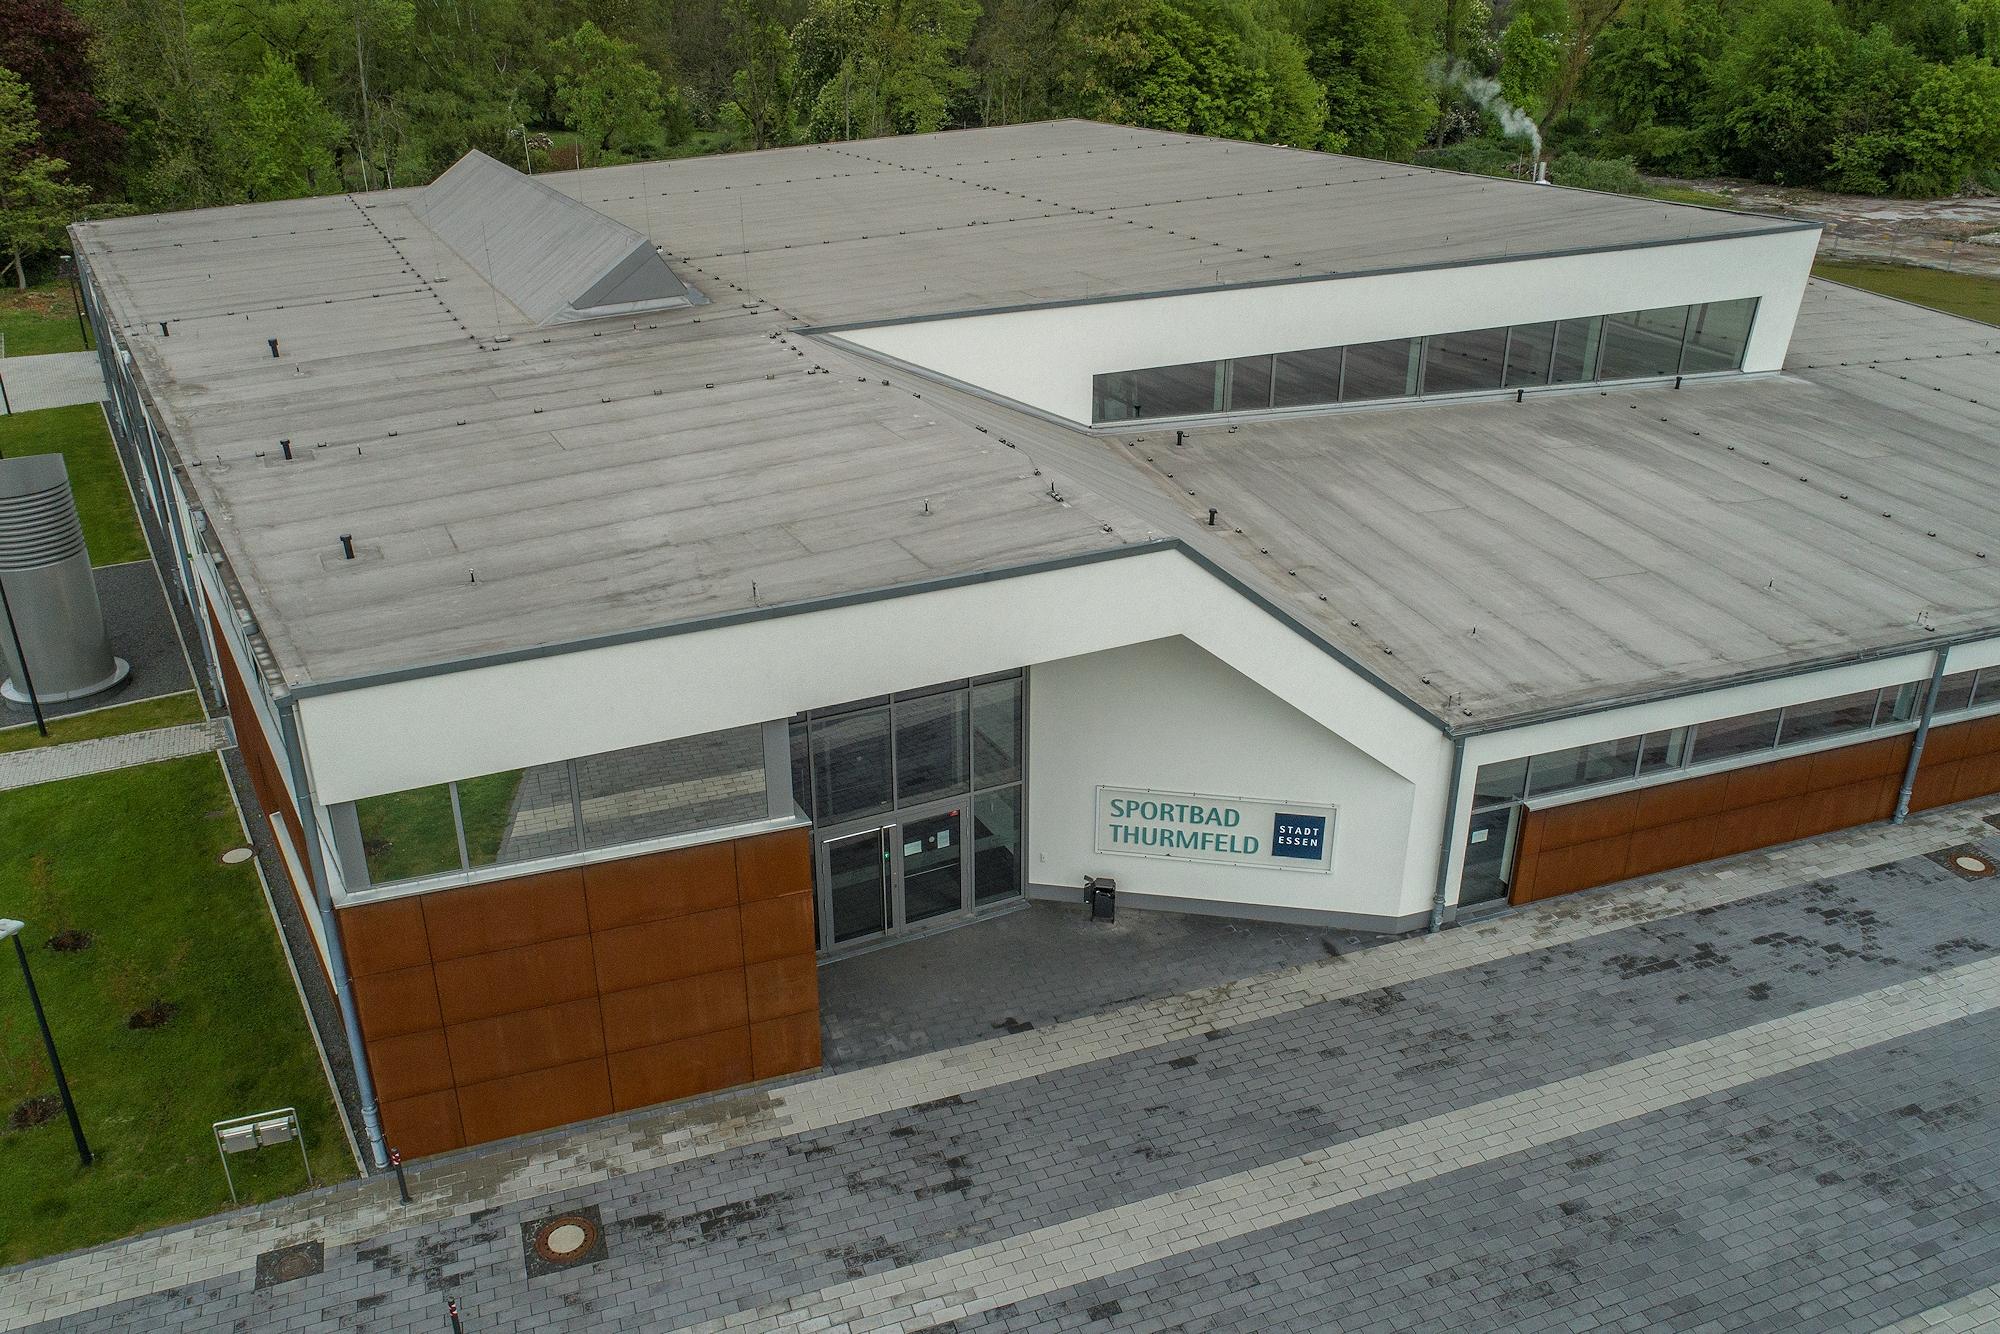 Foto: Luftbildaufnahme des Sportbads Thurmfeld